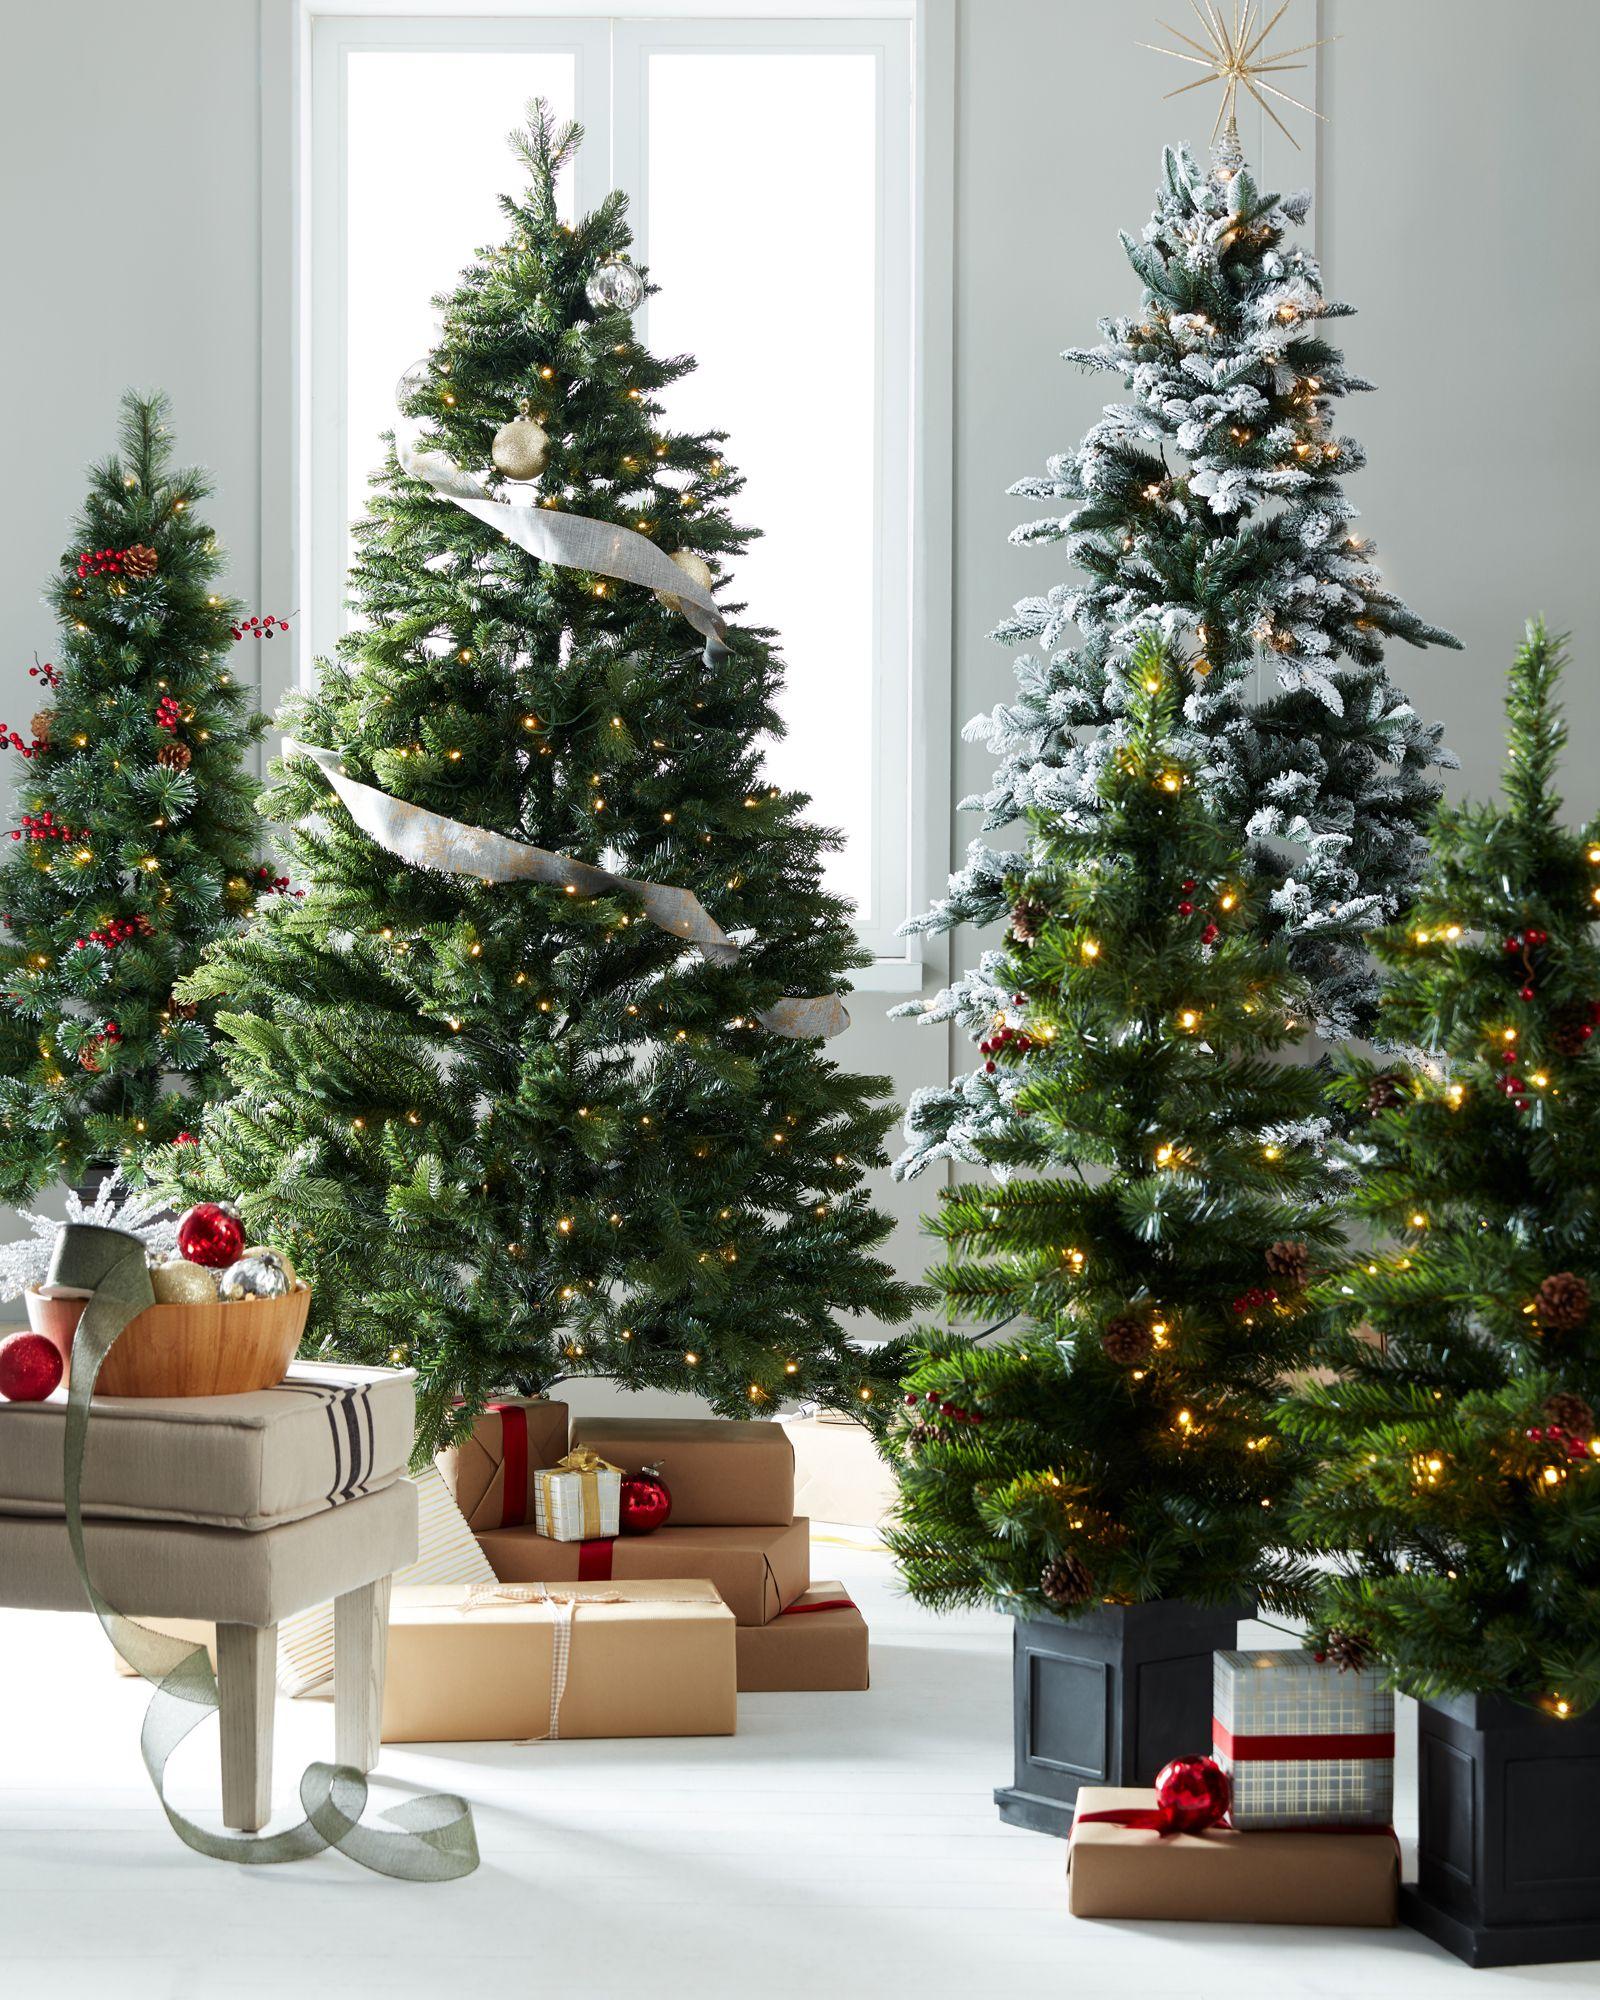 Christmas Tree Ideas 6 Foot Pre Lit Christmas Tree 100 In 2020 Pre Lit Christmas Tree Christmas Tree Bedding Christmas Tree